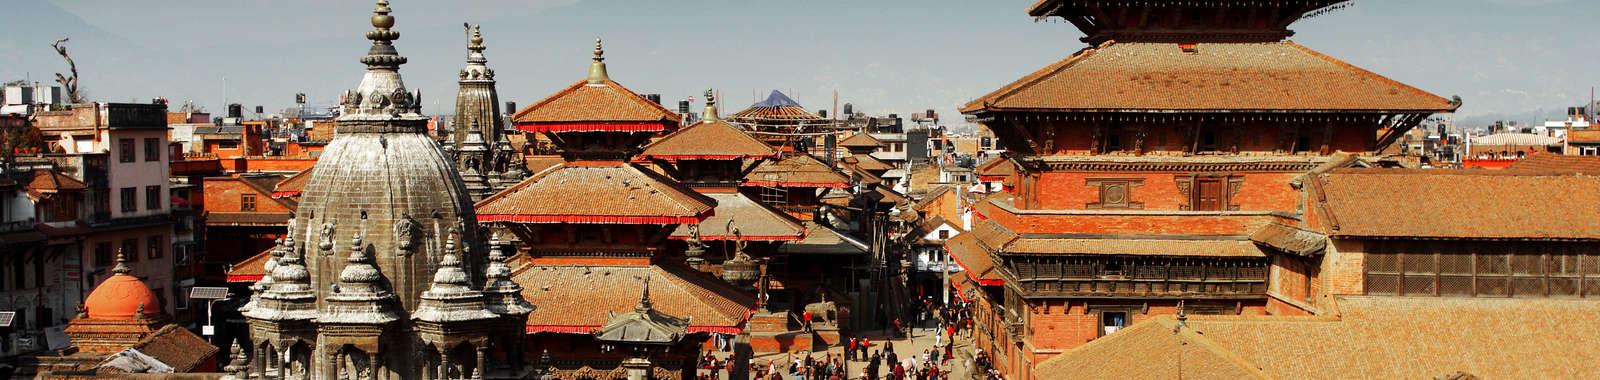 dreamstime_xxl_45565046_KathmandusDurbarSquare,Nepal,Asia